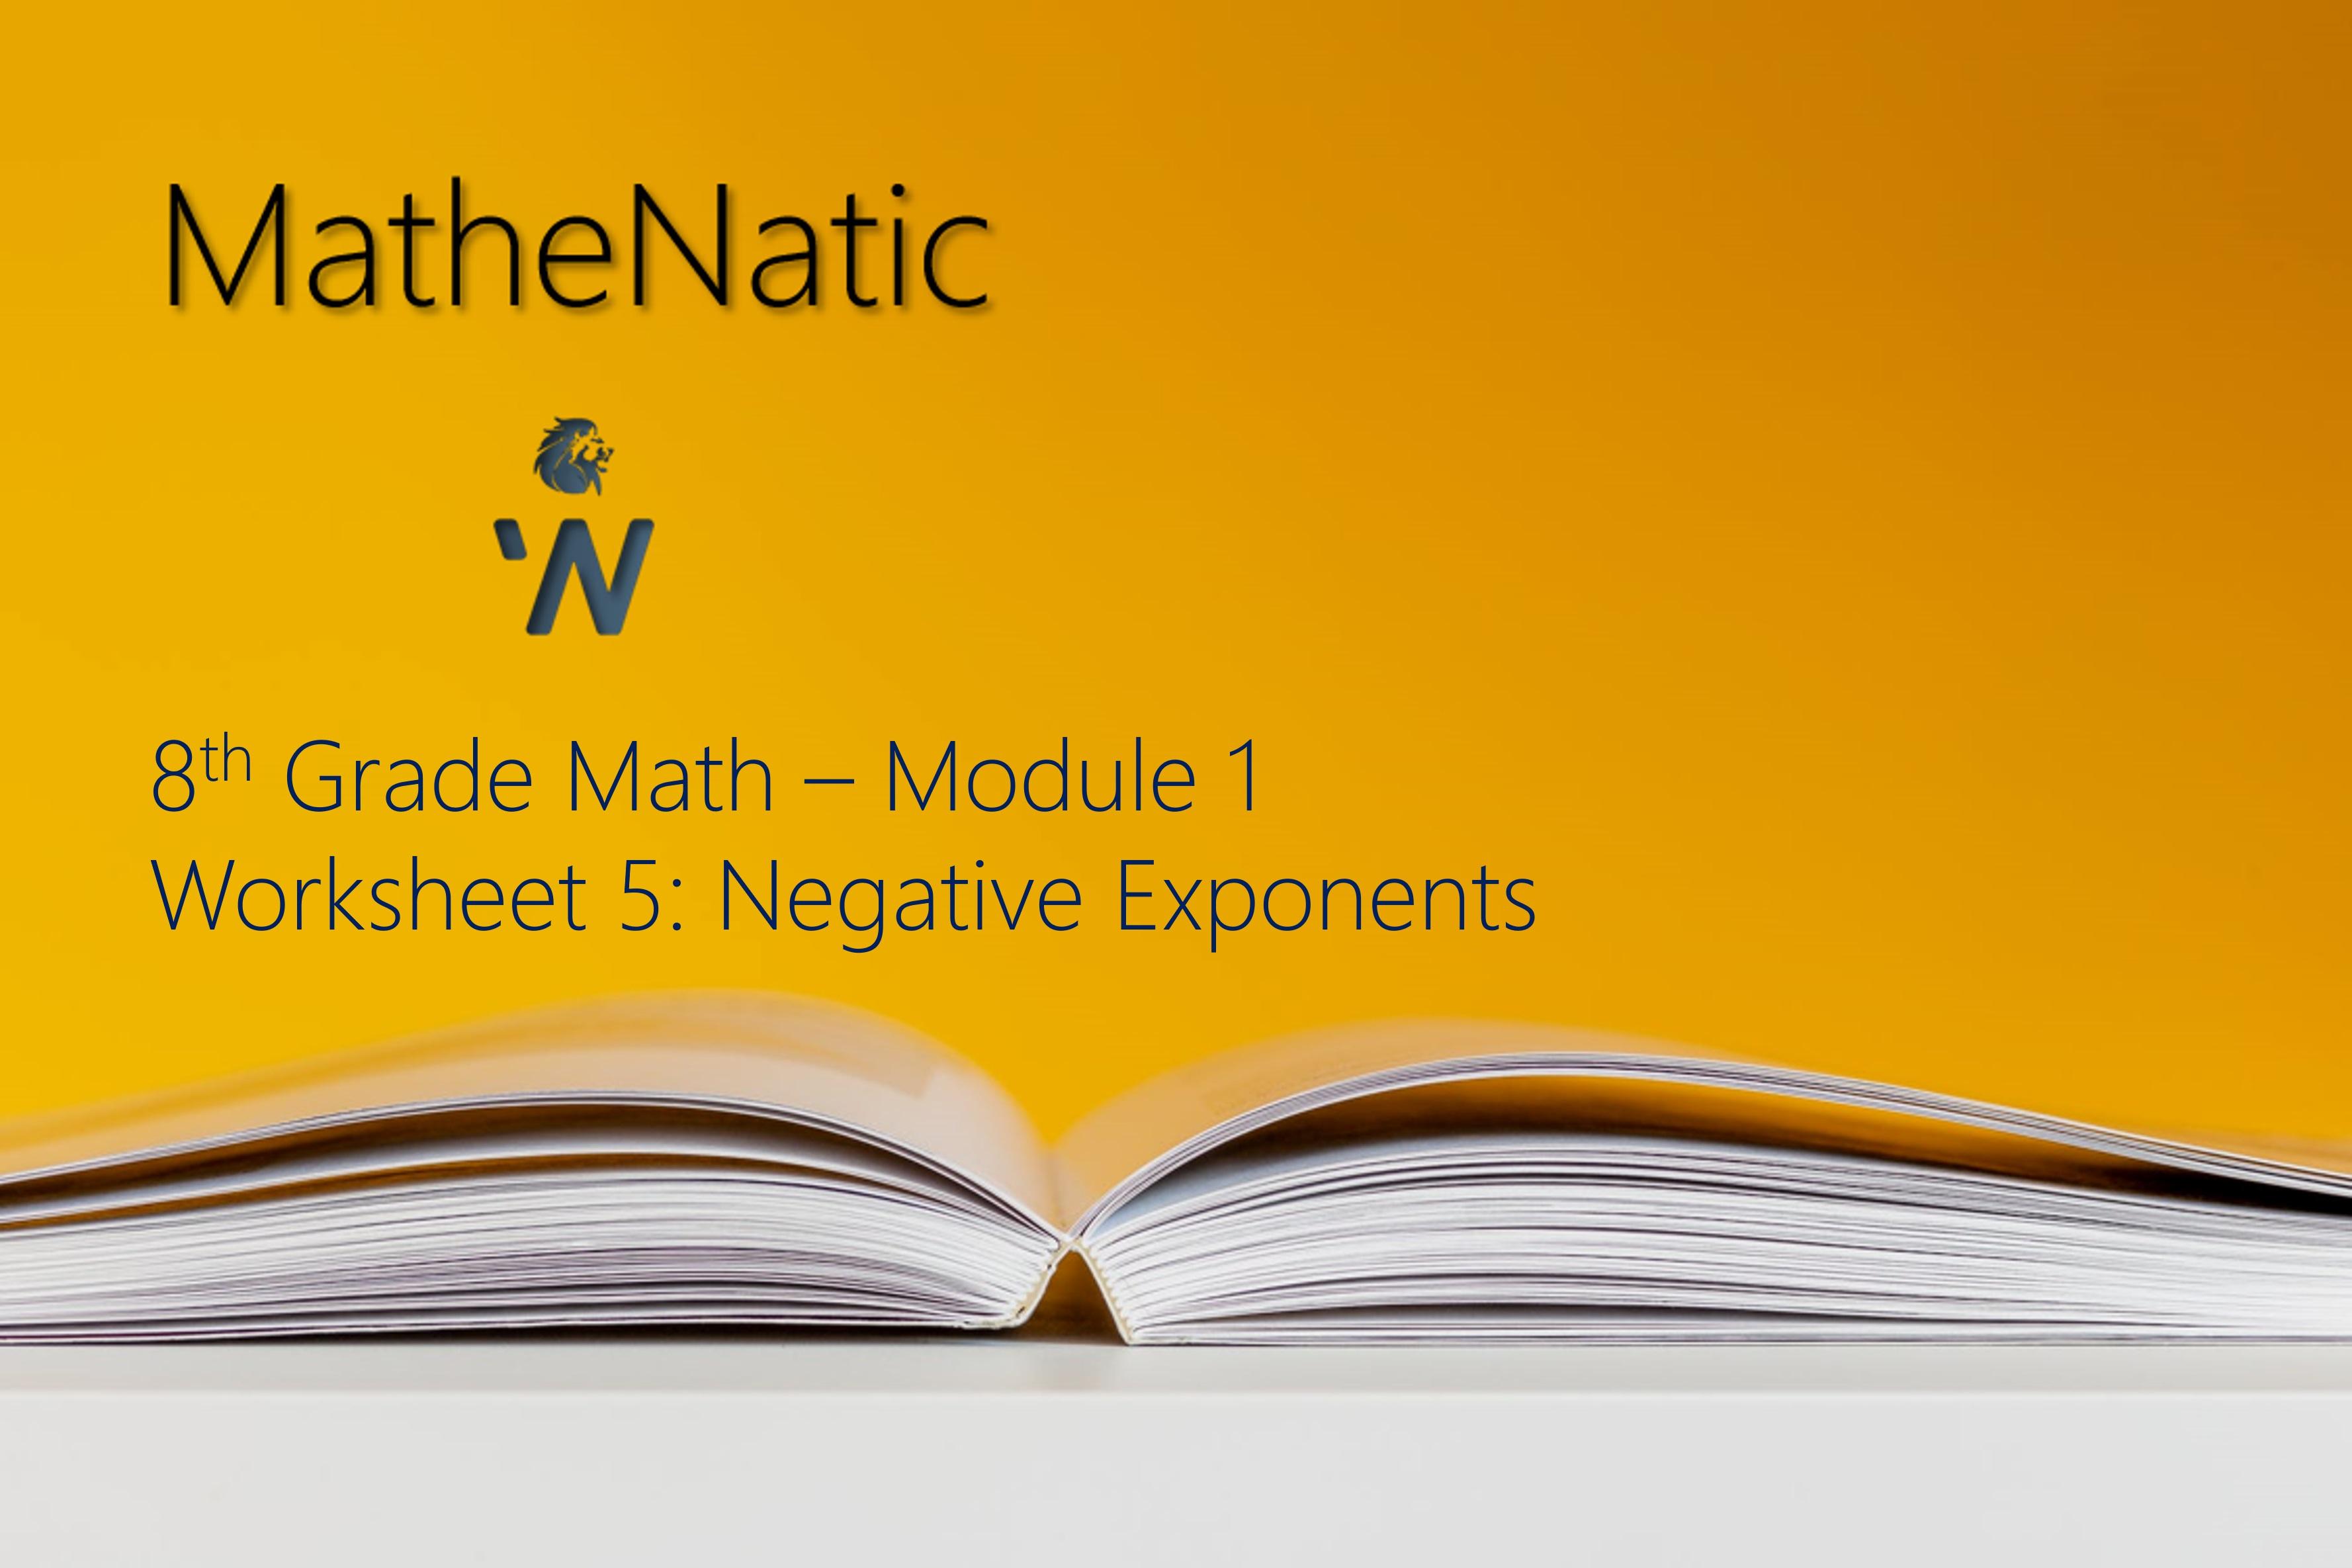 8th Grade Math